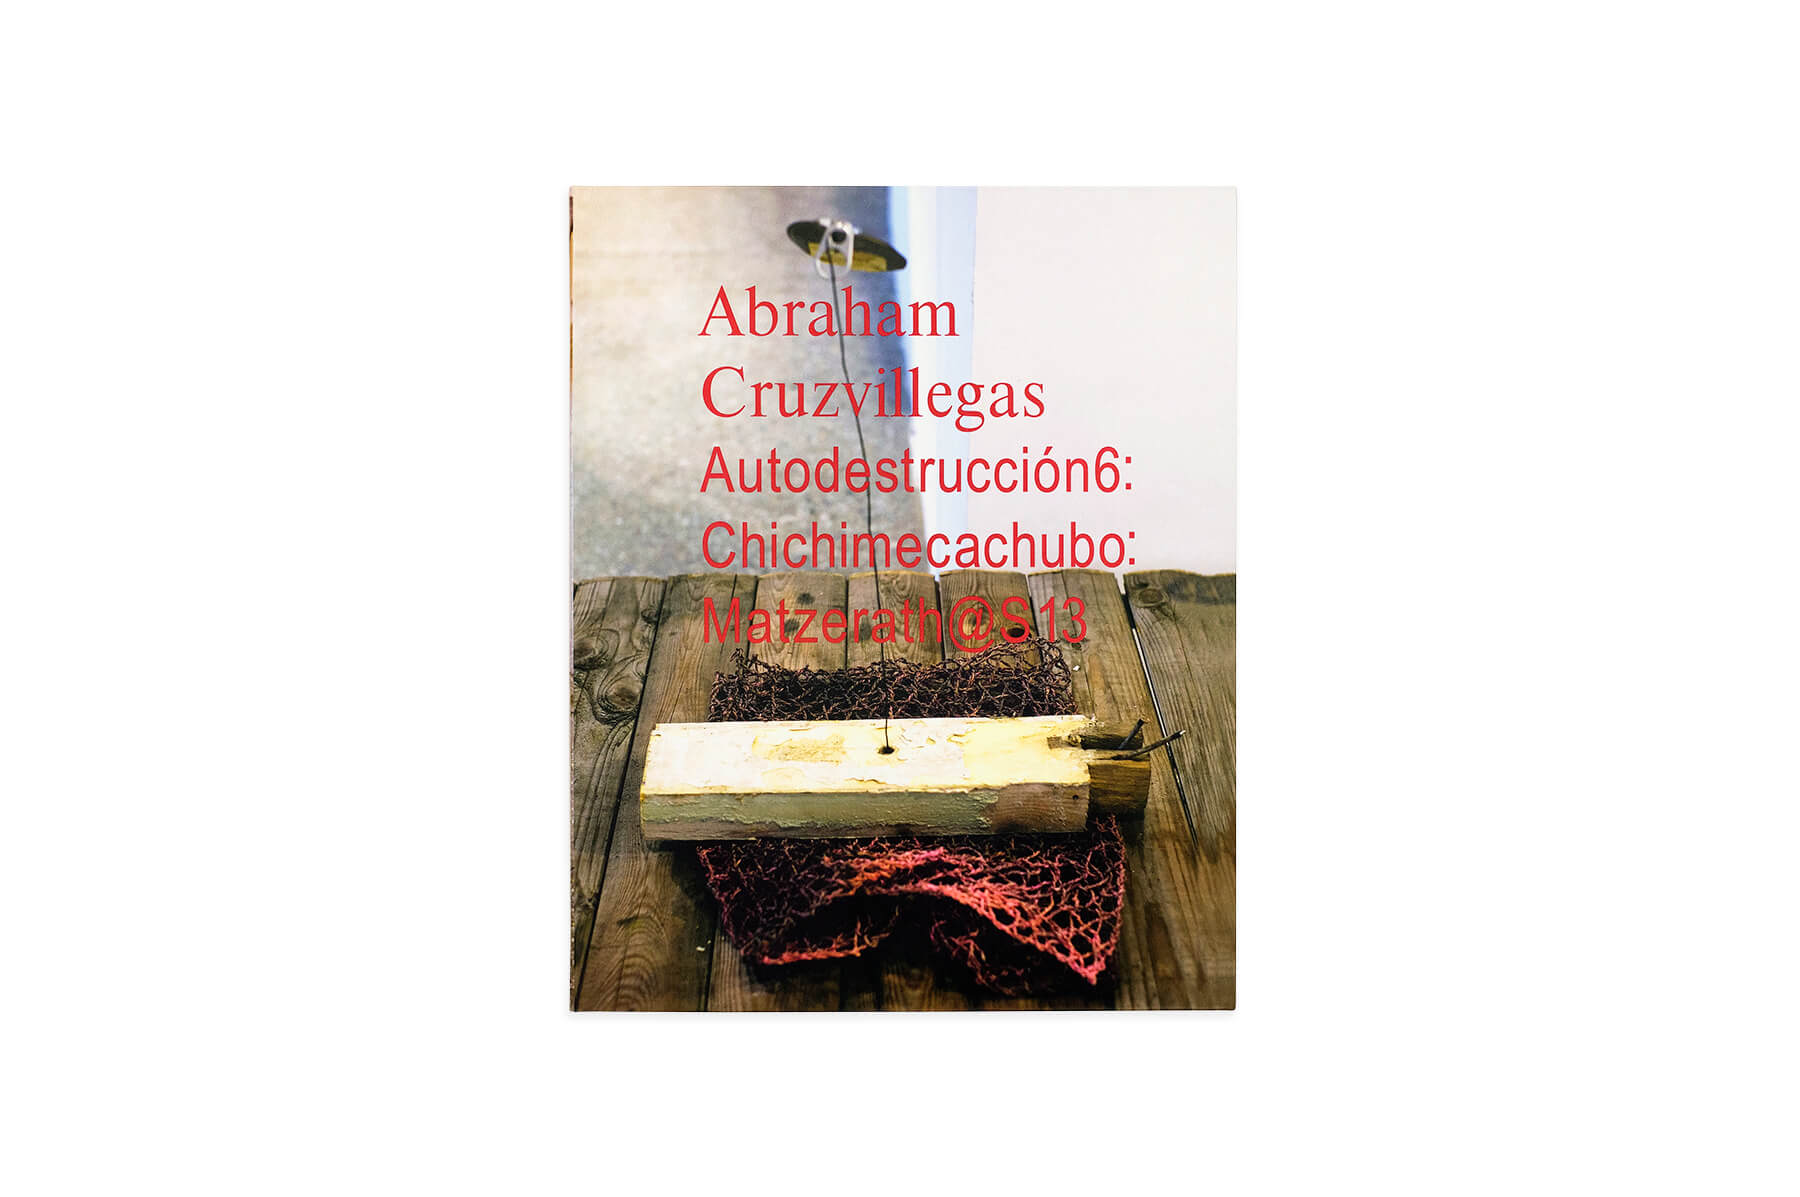 Product image of Abraham Cruzvillegas: Autodestruccíon6: Chichimecachubo: Matzerath@S13